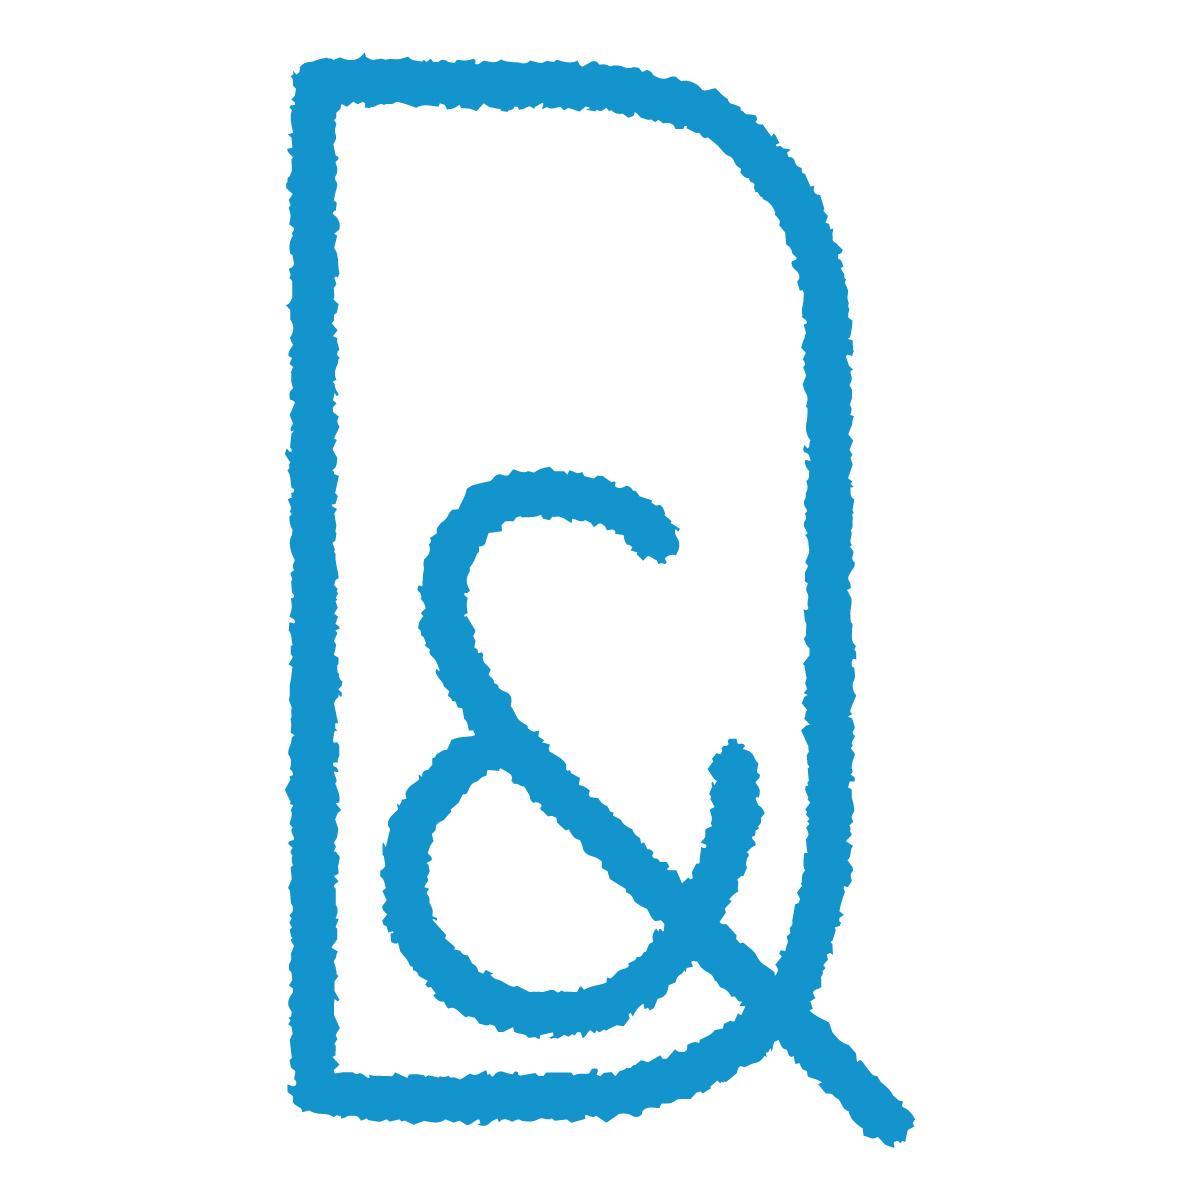 DutchessQueen_logo_blue-on-white.jpg